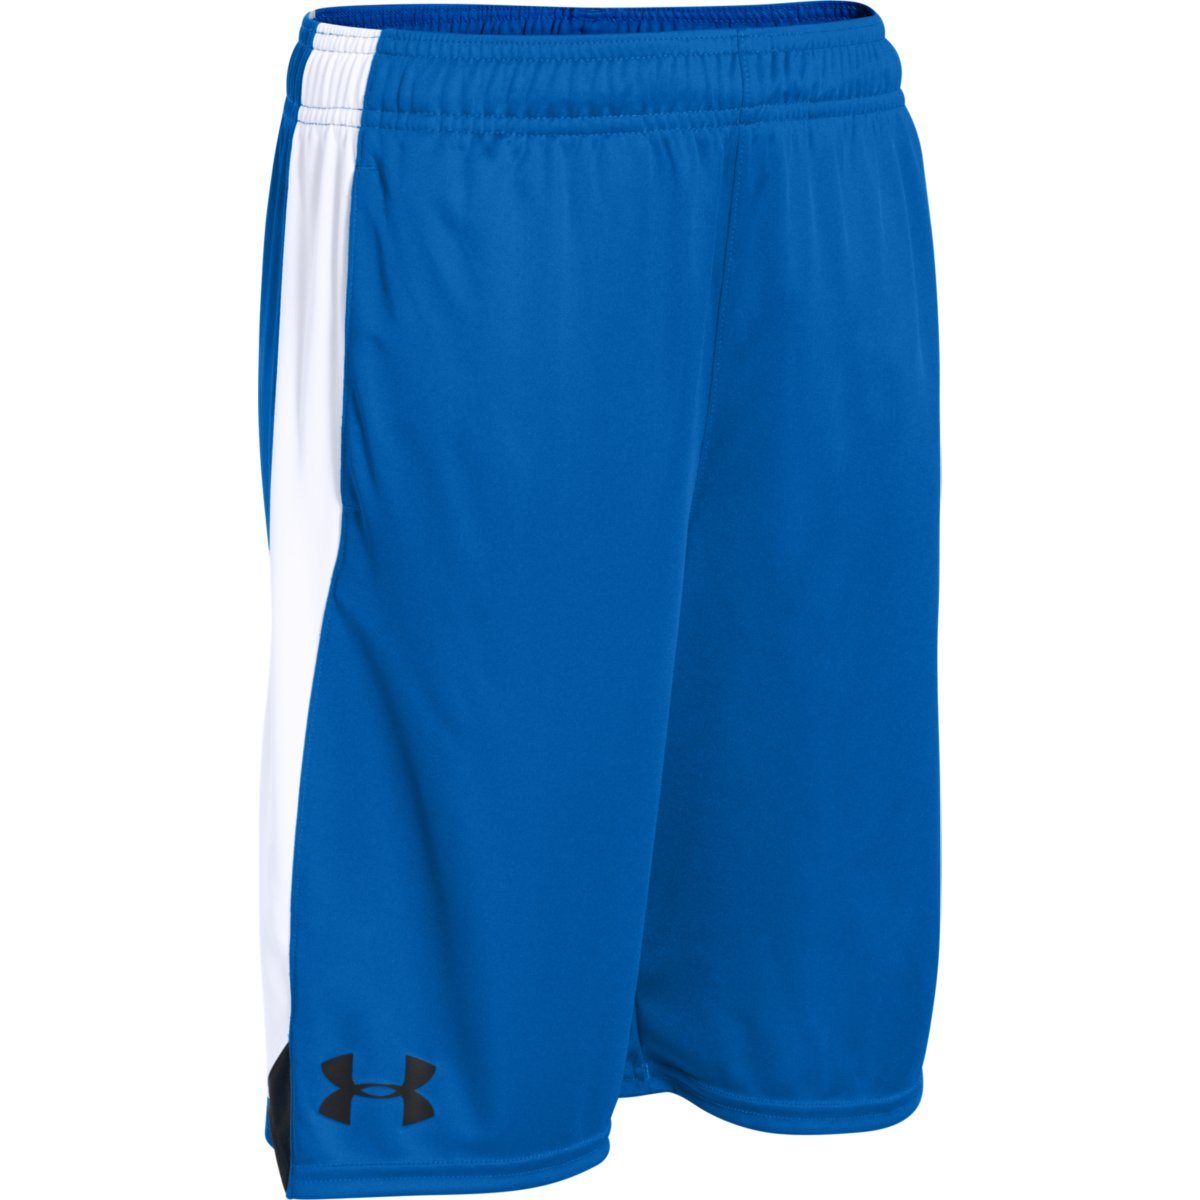 Under Armour Boys' Eliminator Shorts - Blue, L